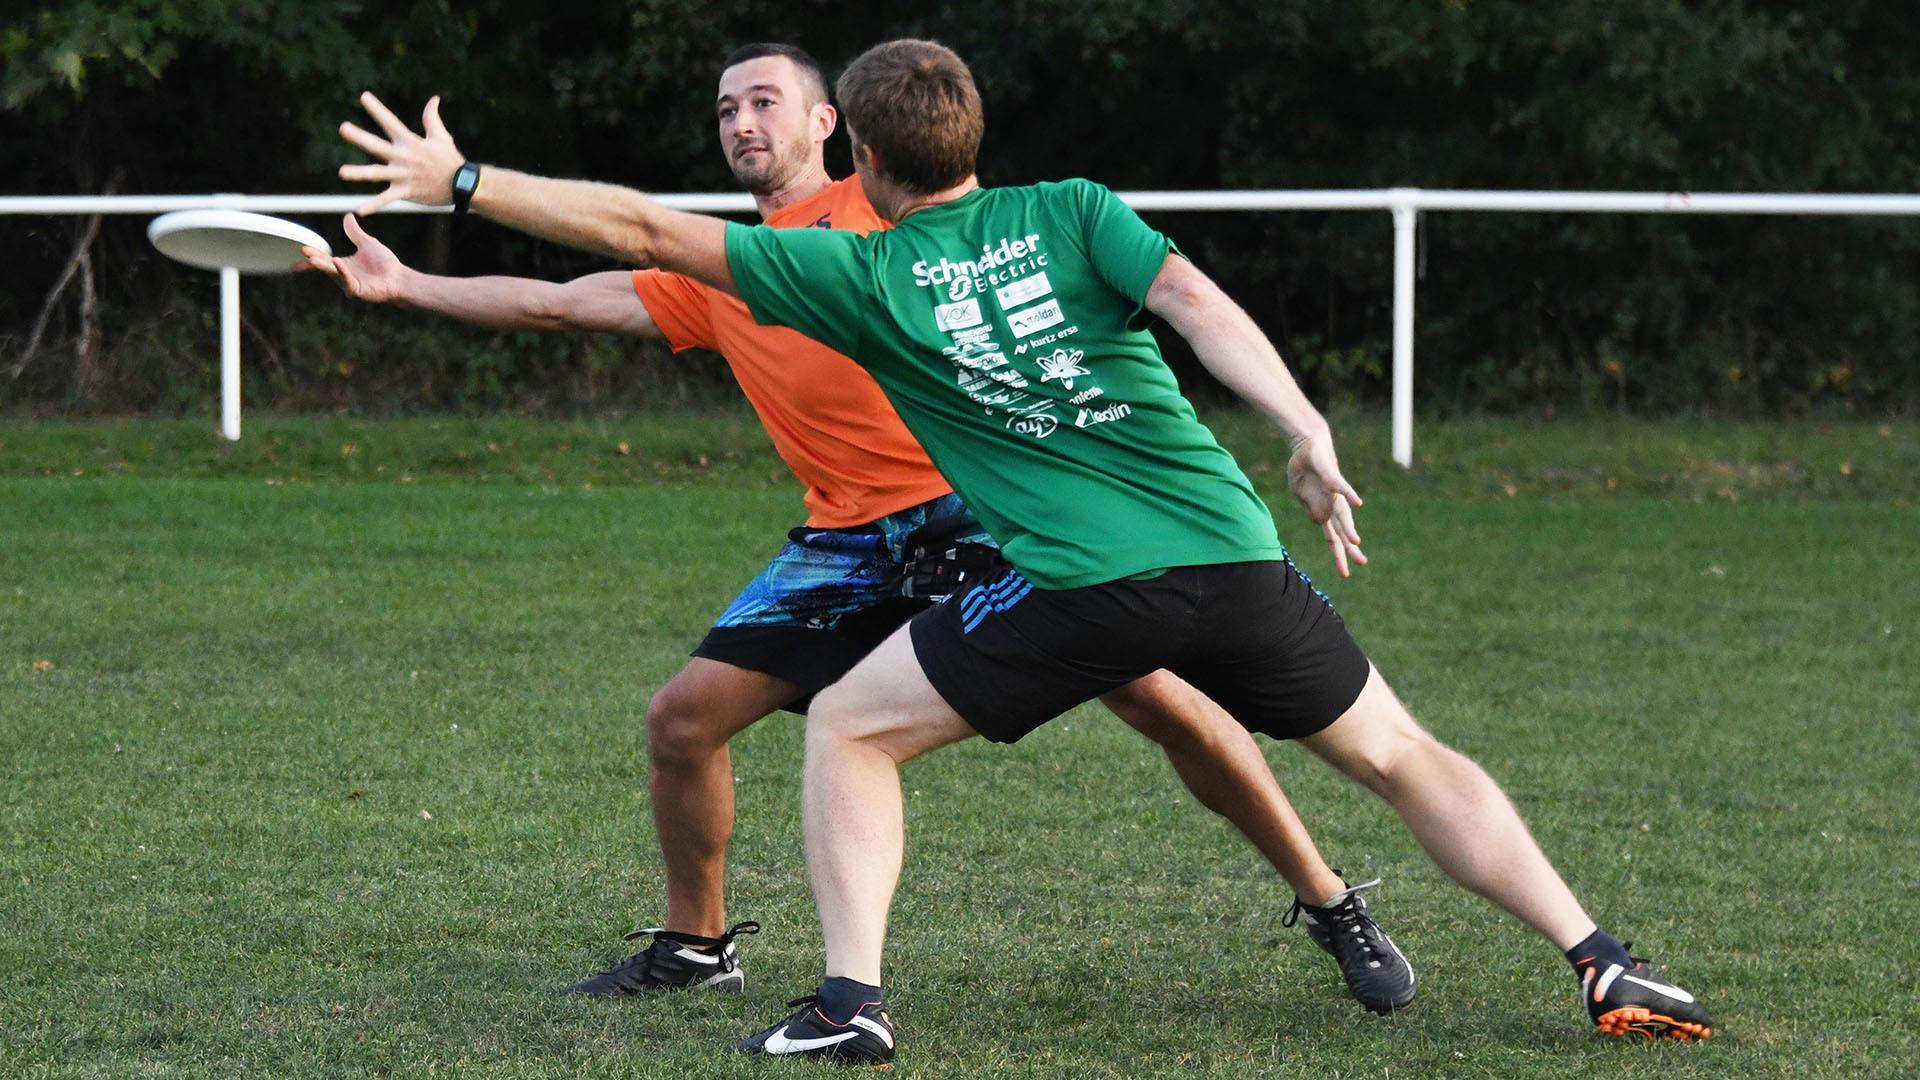 A Rixheim le premier club de frisbee du Haut-Rhin : un jeu intense